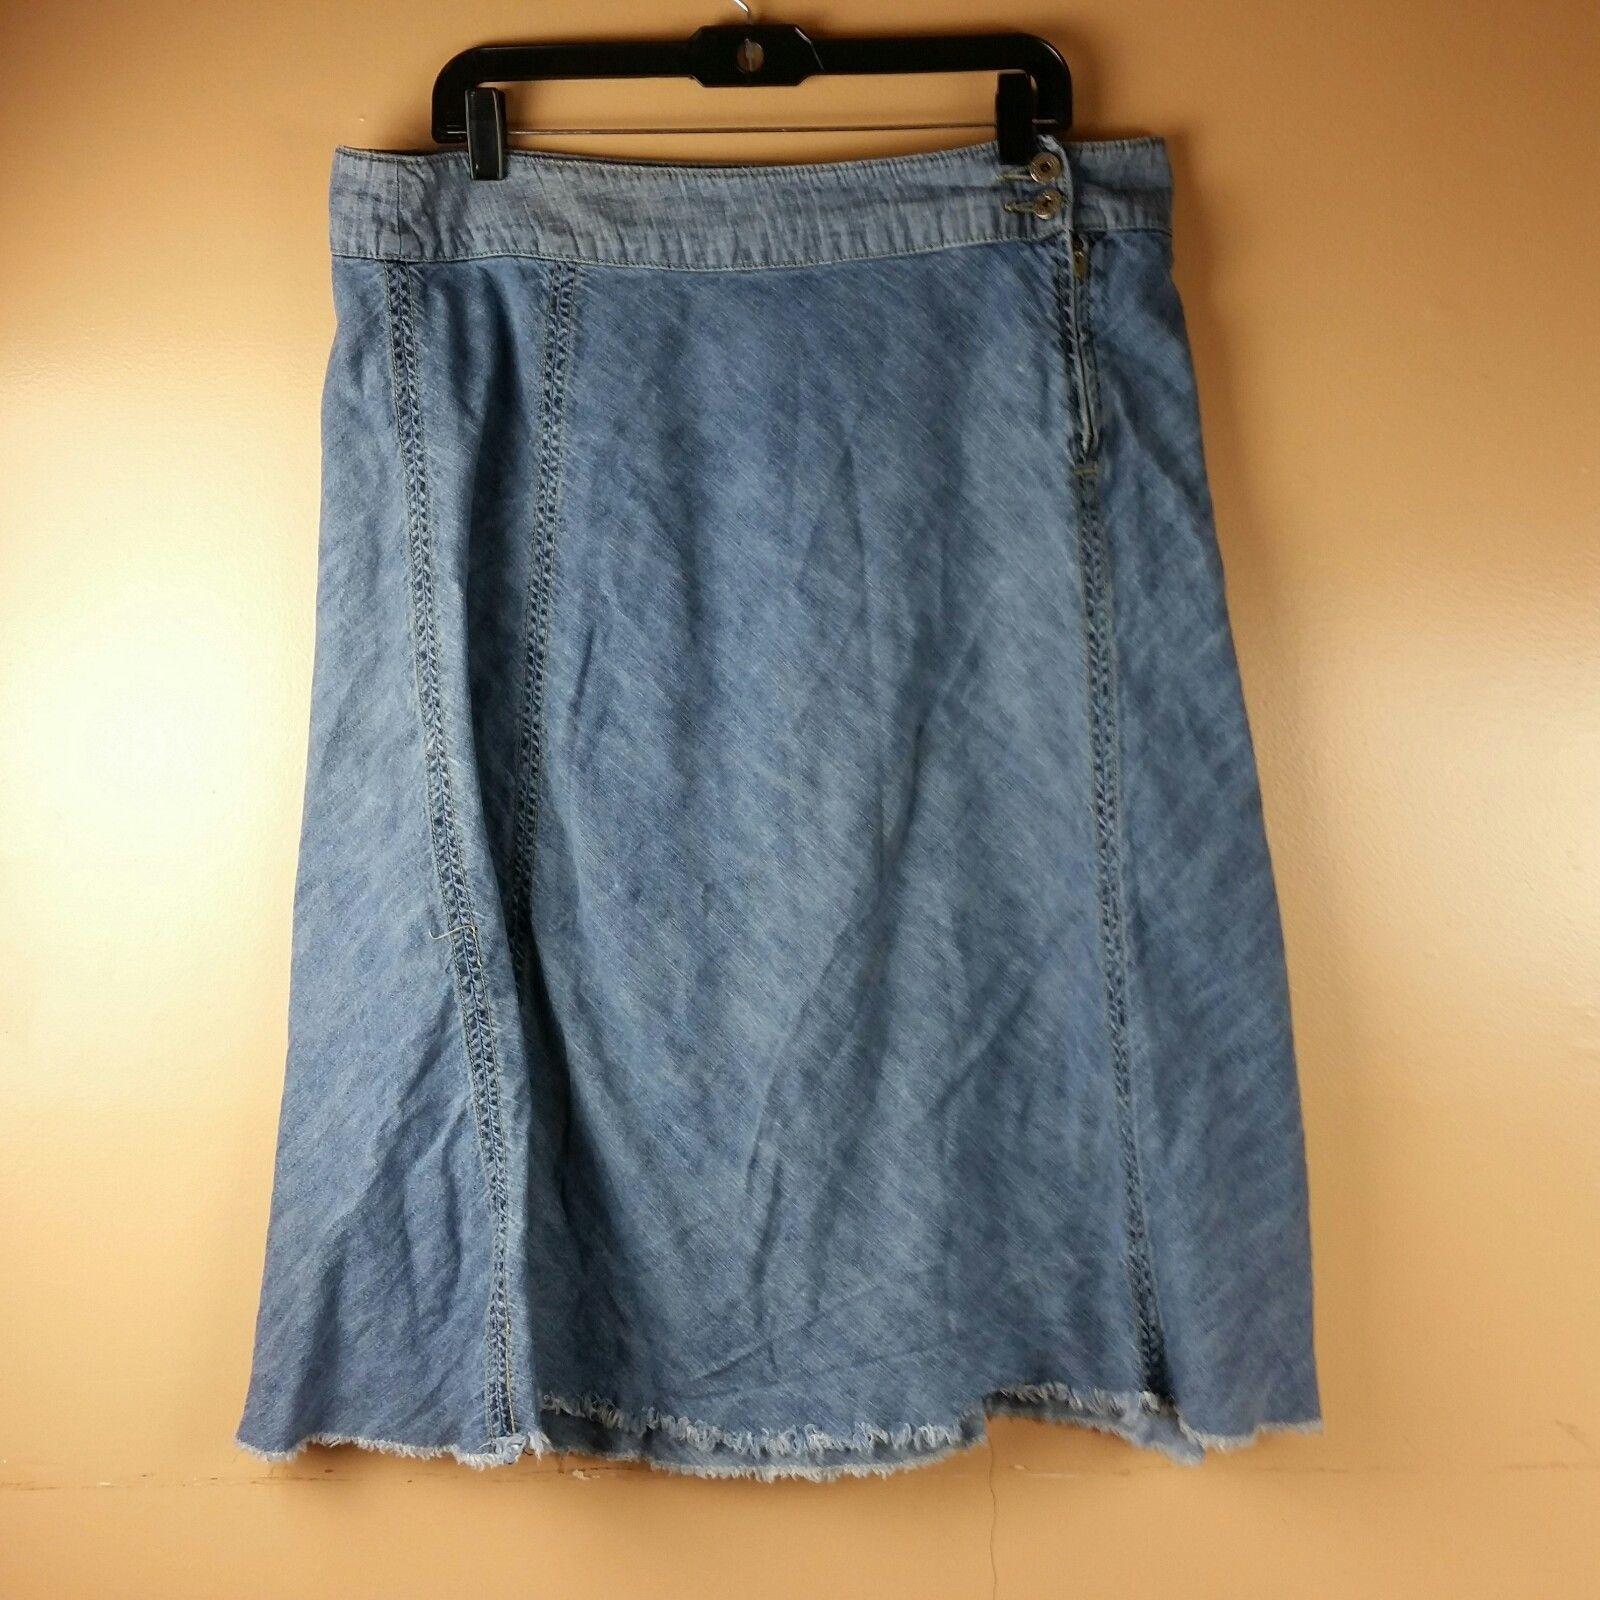 LEE Jean Skirt Womens One True Fit Modest Denim Fringe Hem Size 15/16M image 5